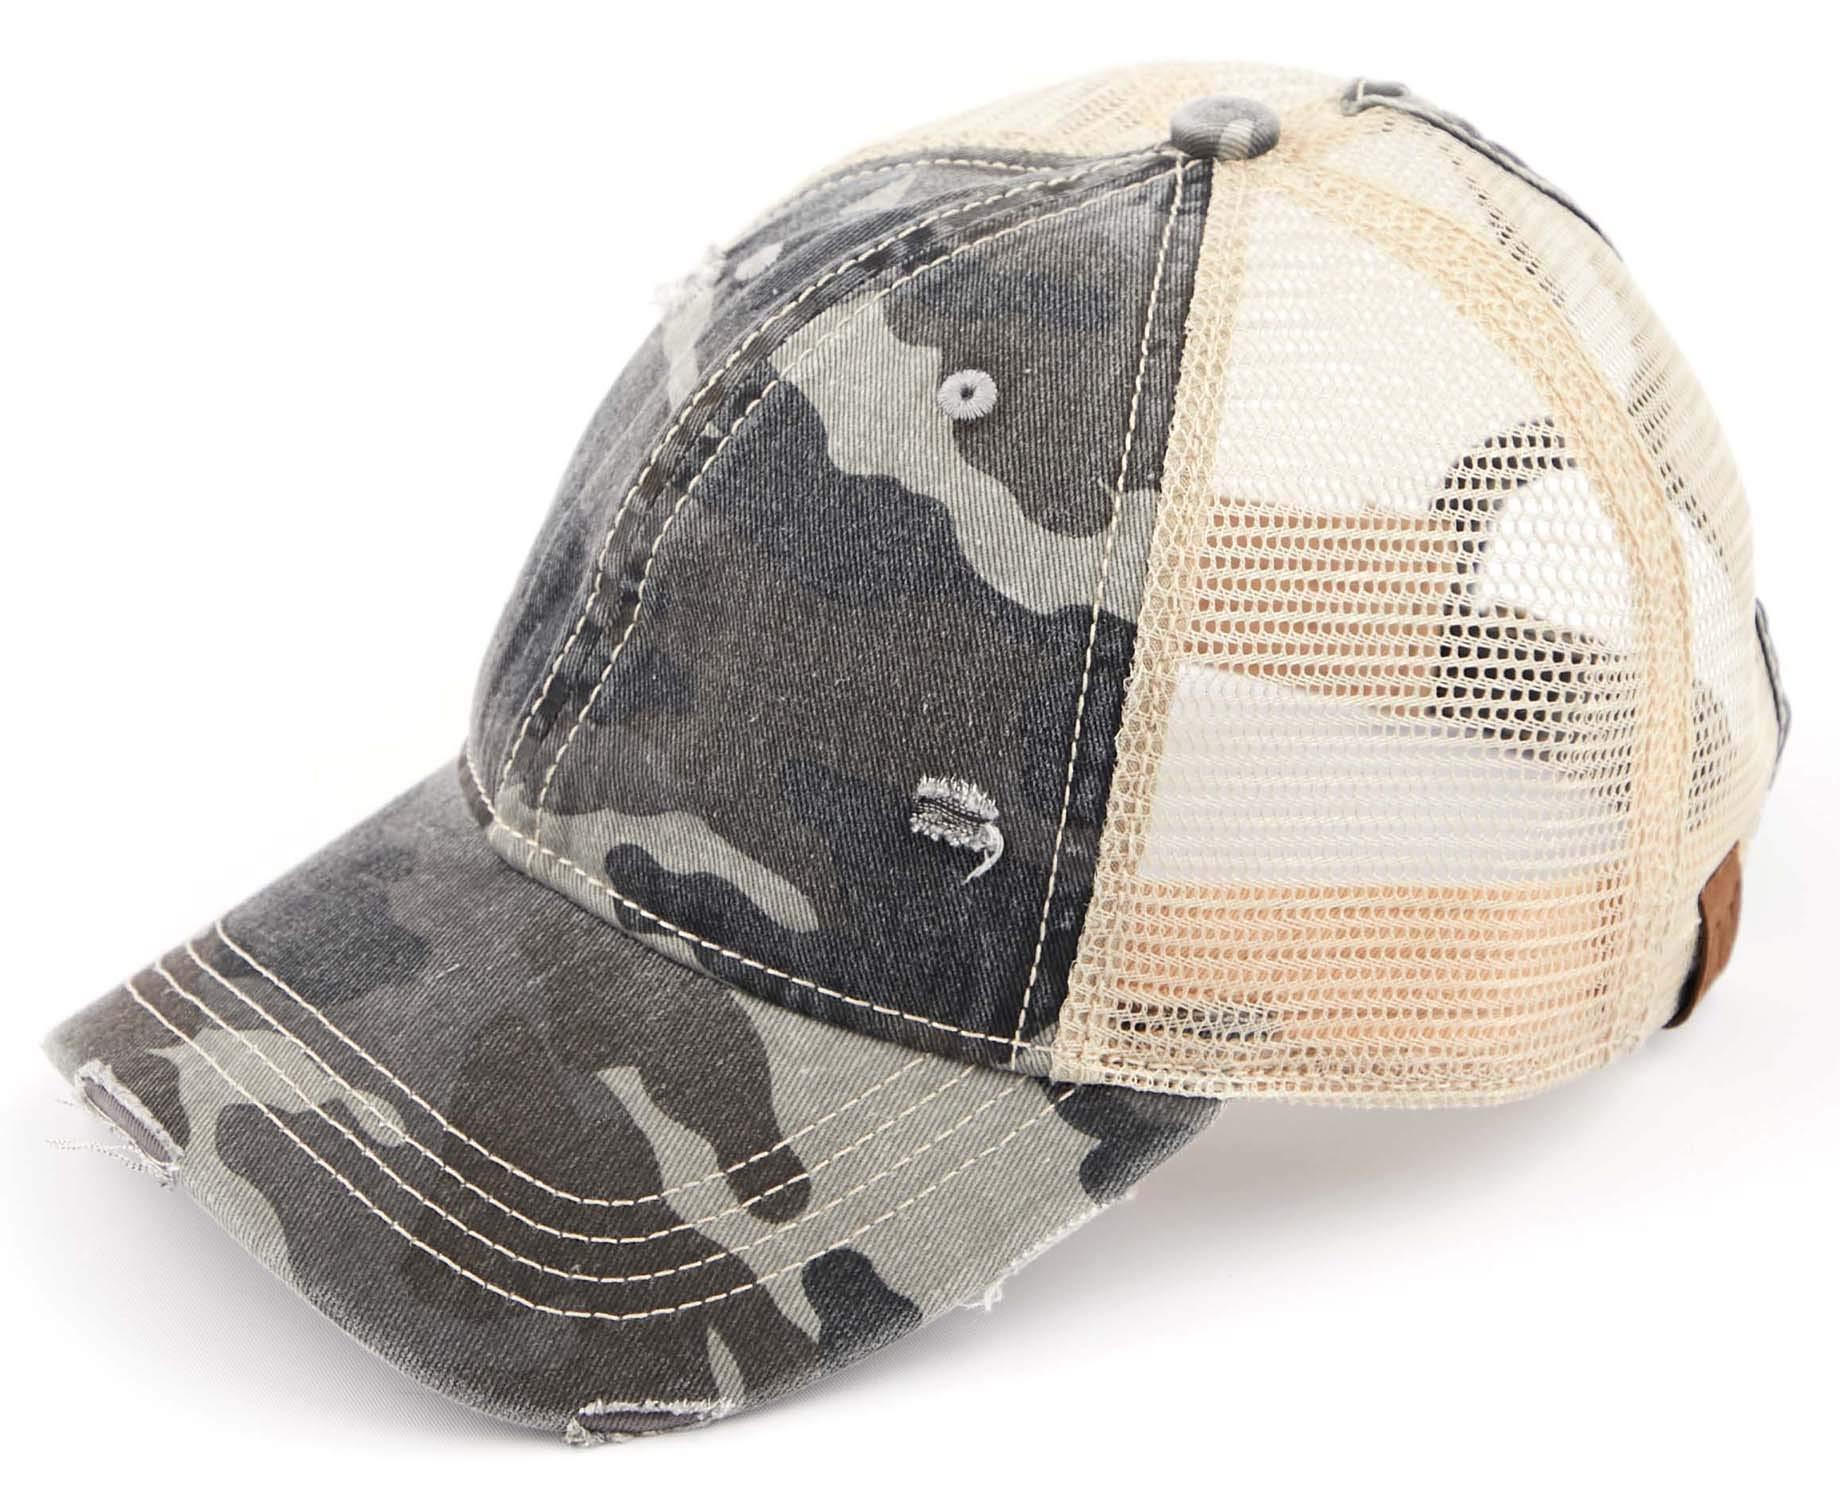 H-6140-914-0684 Distressed Trucker Hat - Black Camo/Beige Mesh